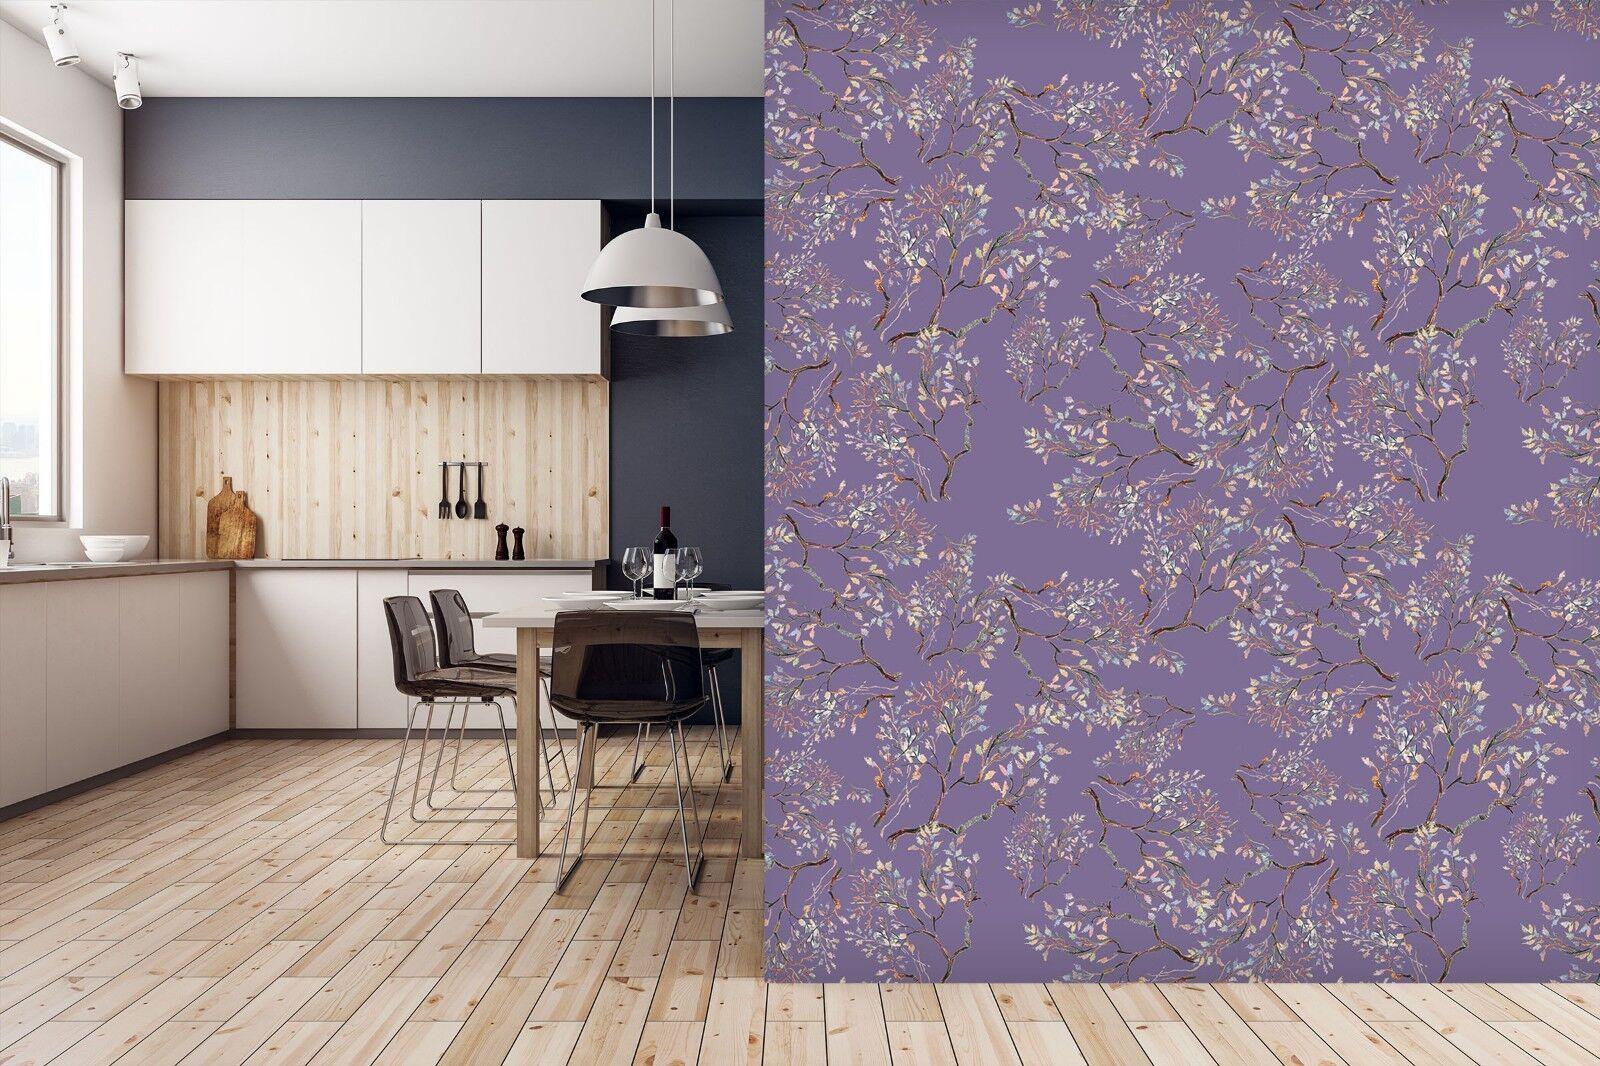 3D Flower Pattern 41 Texture Tiles Marble Wall Paper Decal Wallpaper Mural AJ AU